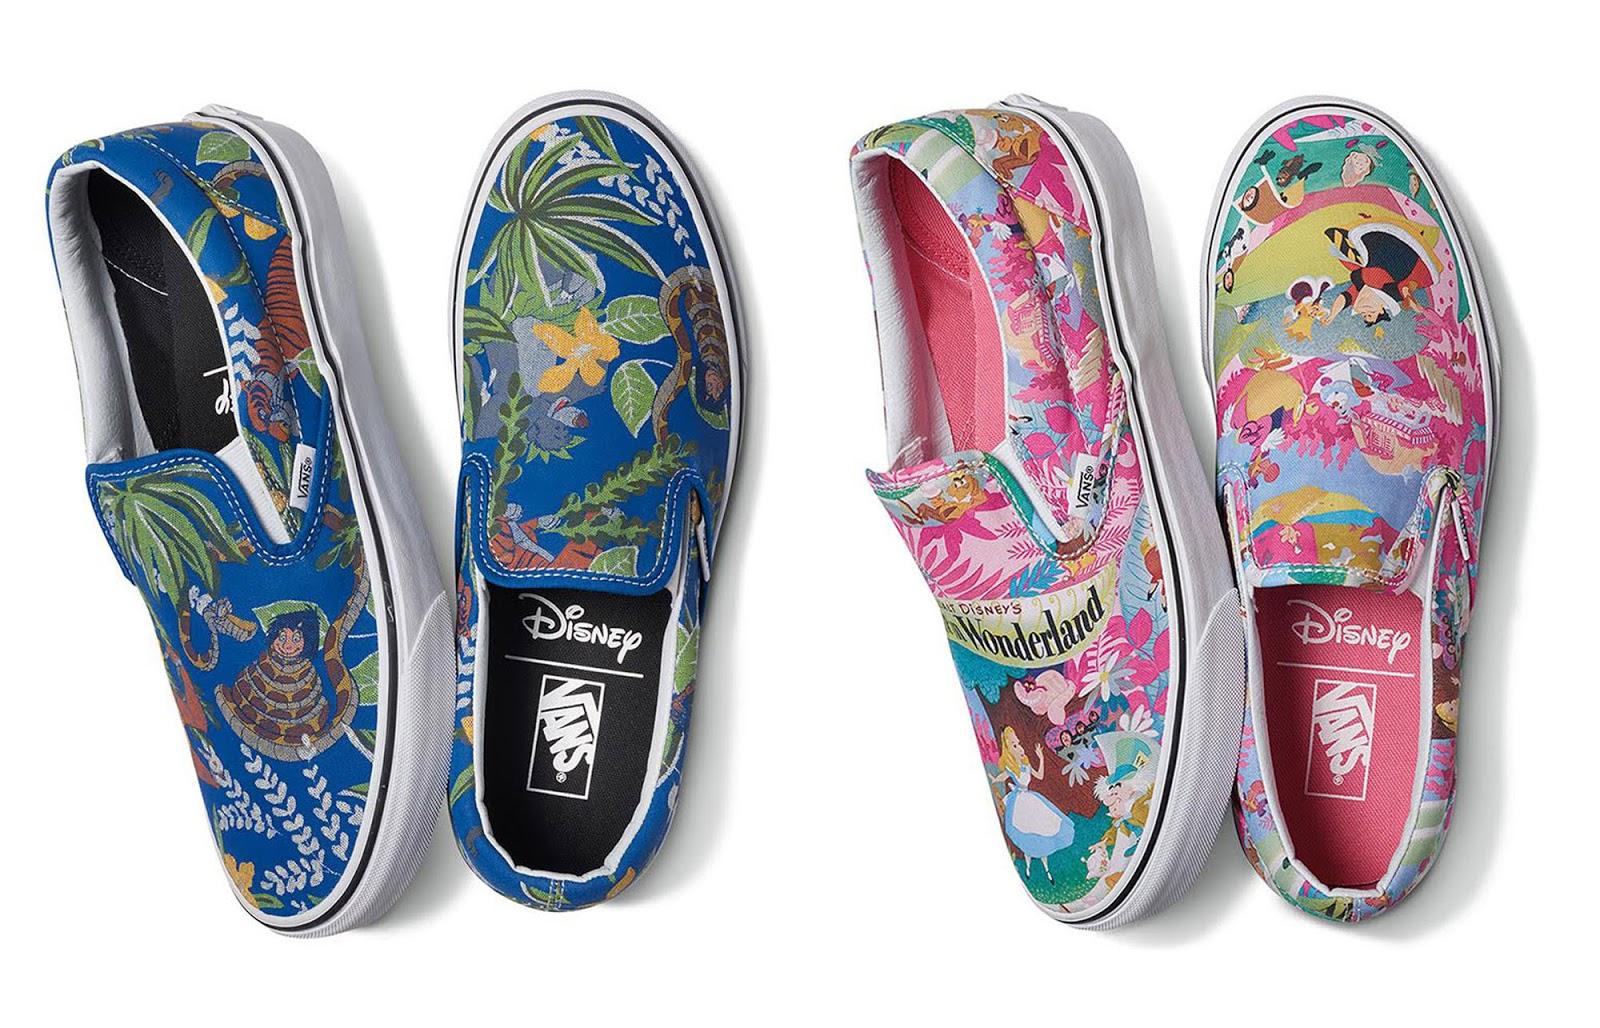 Eniwhere Fashion - Vans for Disney